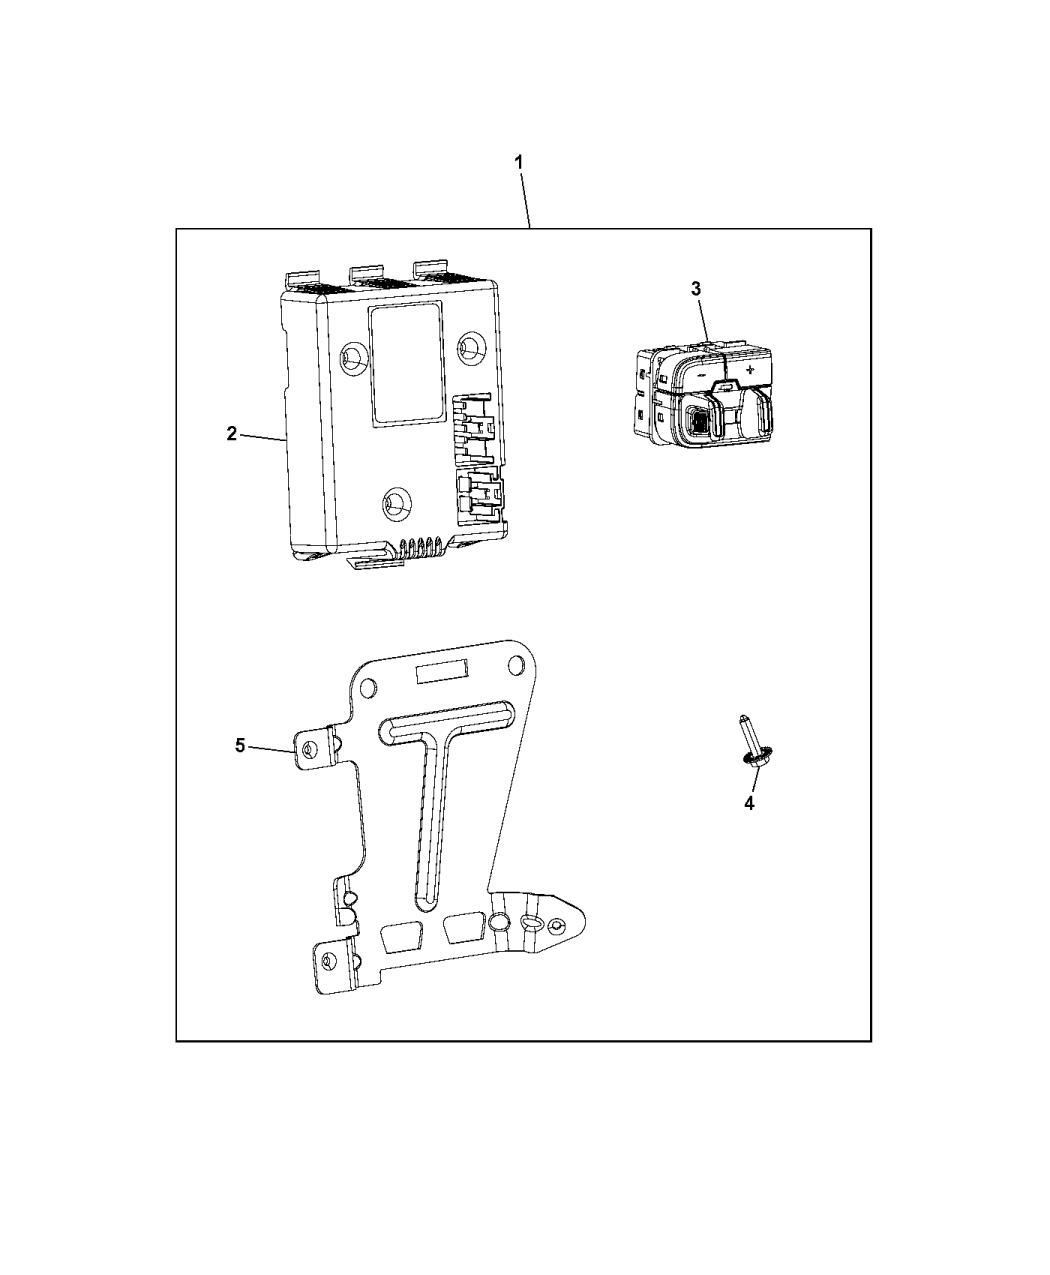 82215040ab